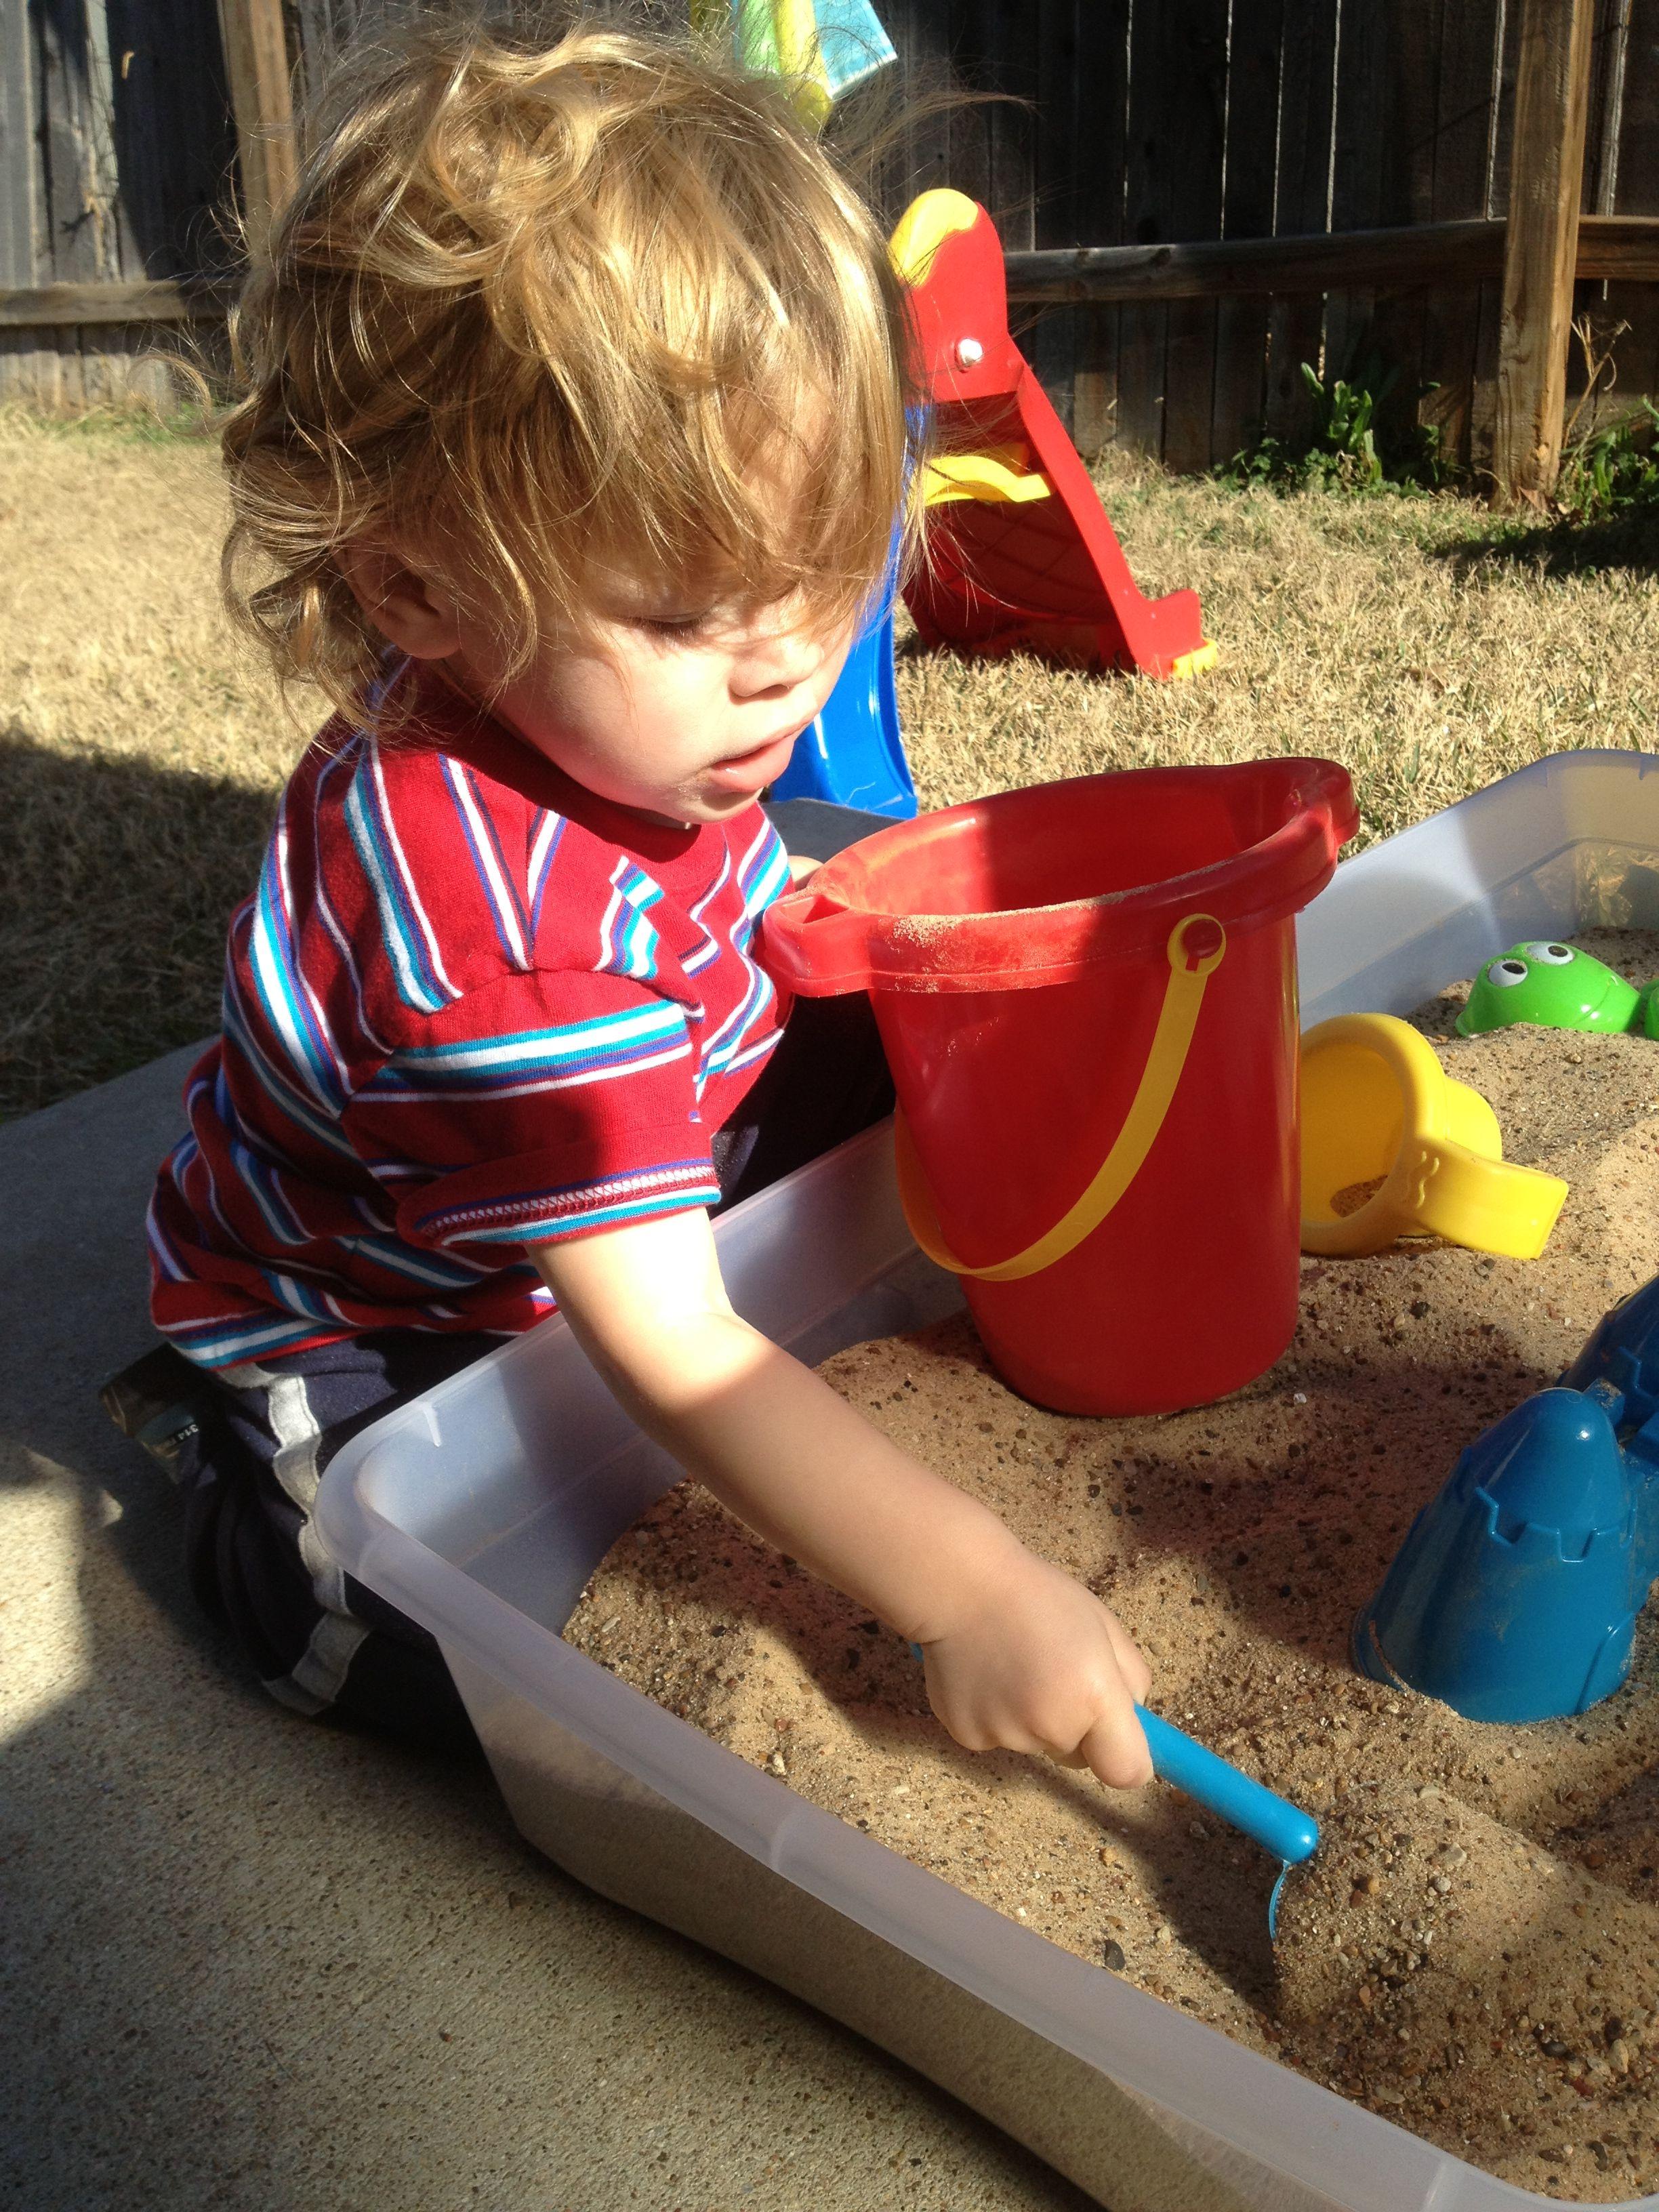 Diy Sandbox 15 00 For Bin And Dollar Sand Toys From Walmart 2